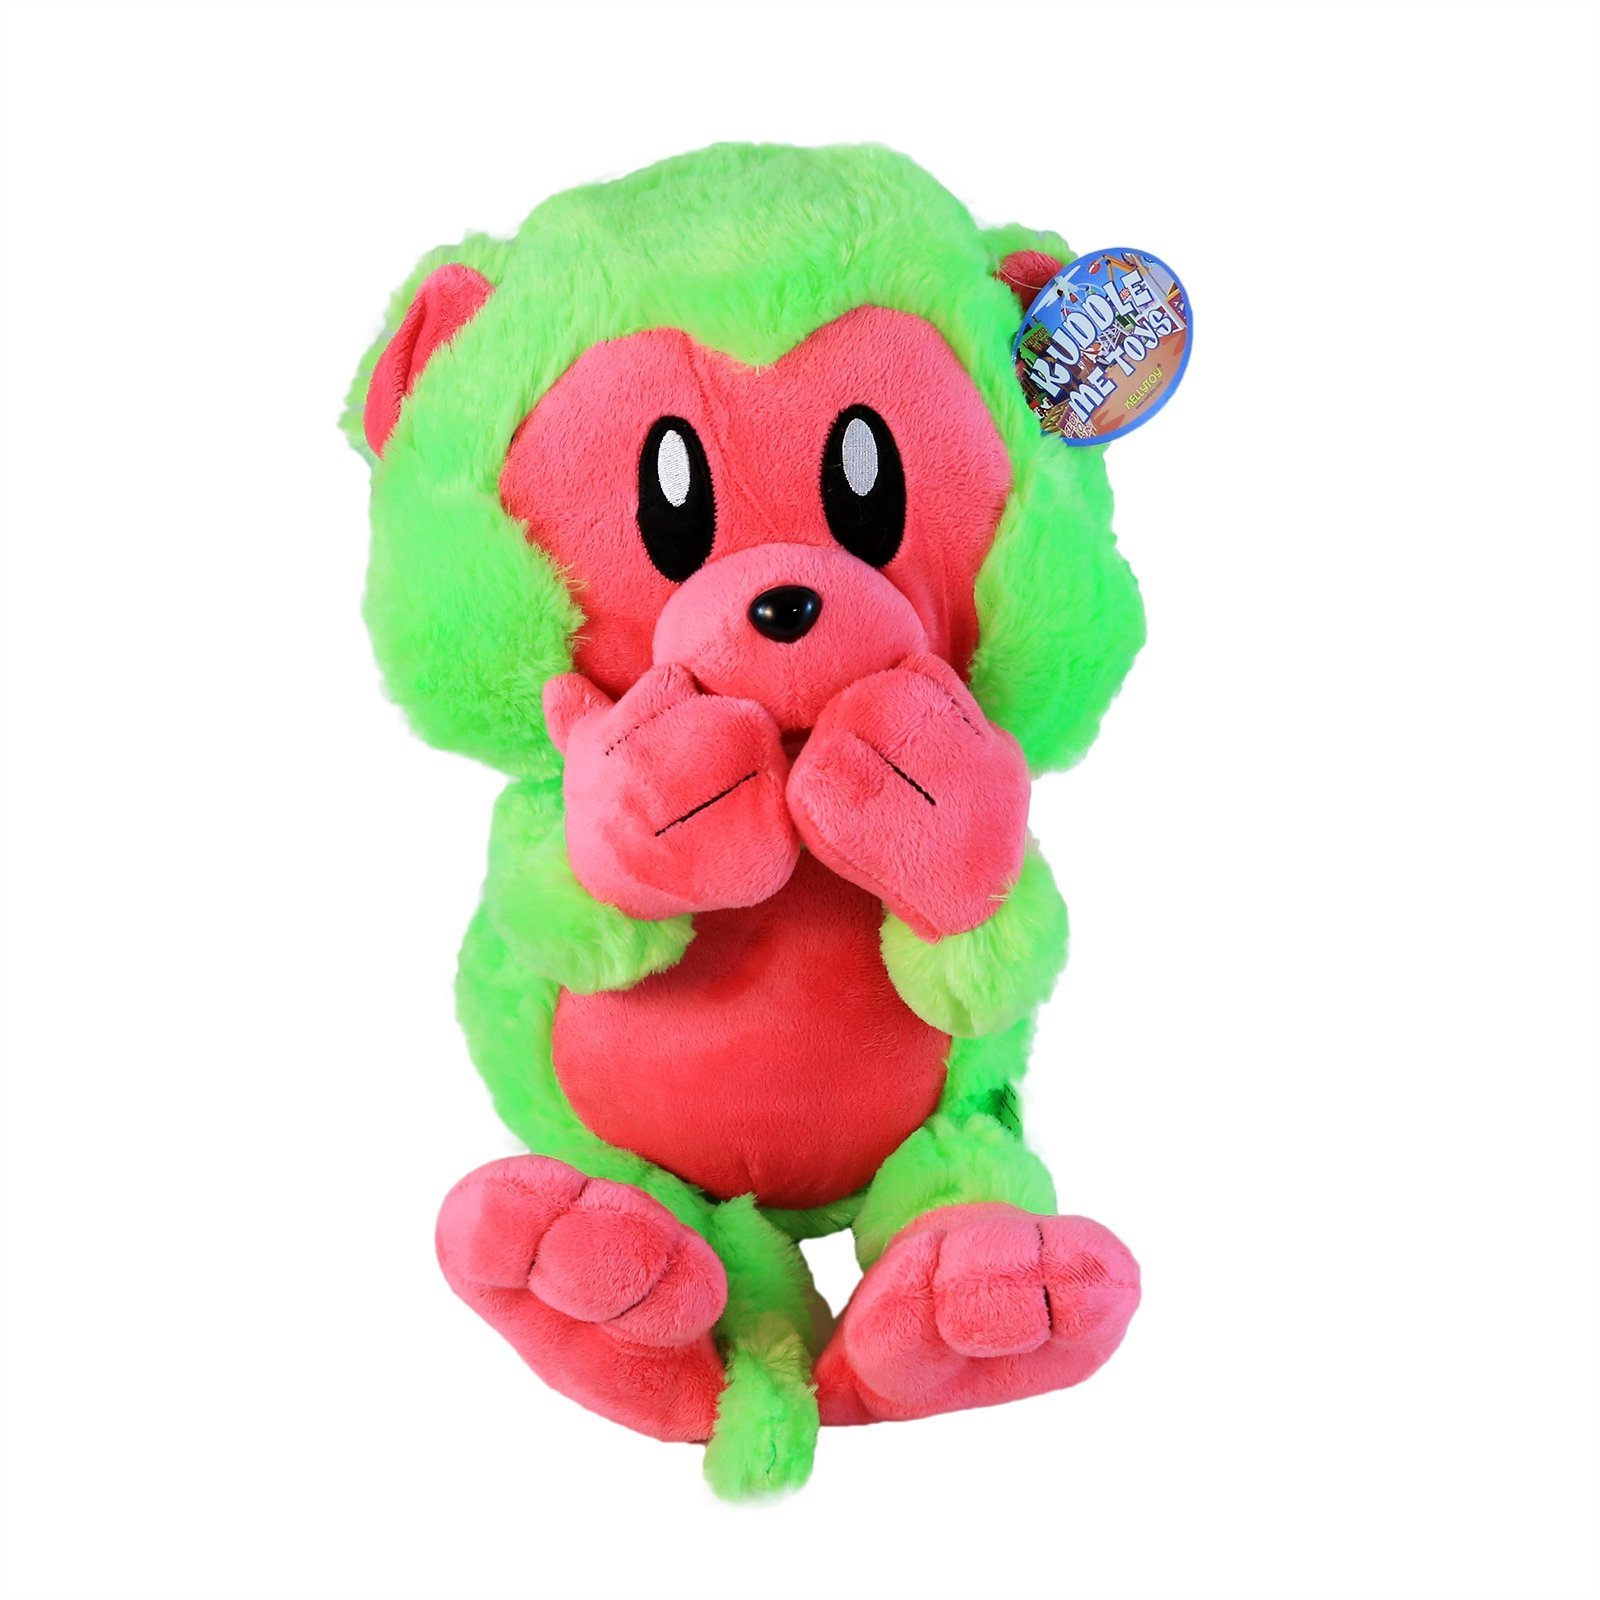 KidPlay Kuddle Toys Speak No Evil Plush Monkey Stuffed Animal Gift - Green